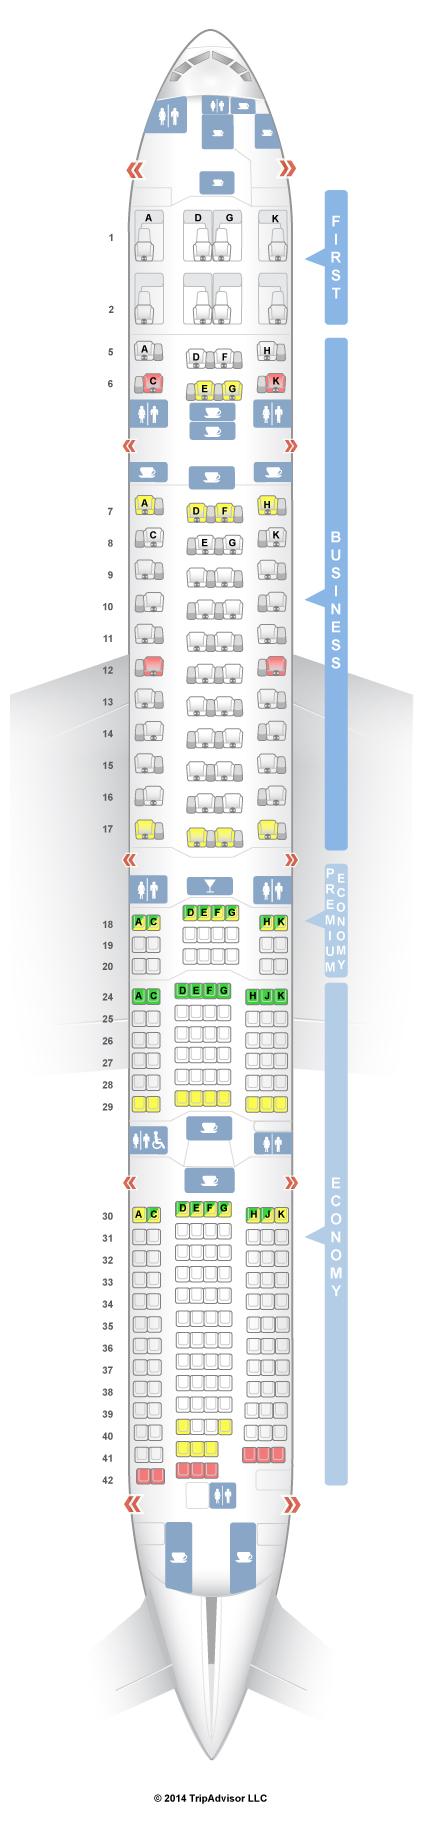 SeatGuru Seat Map ANA Boeing 777-300ER (77W) V1